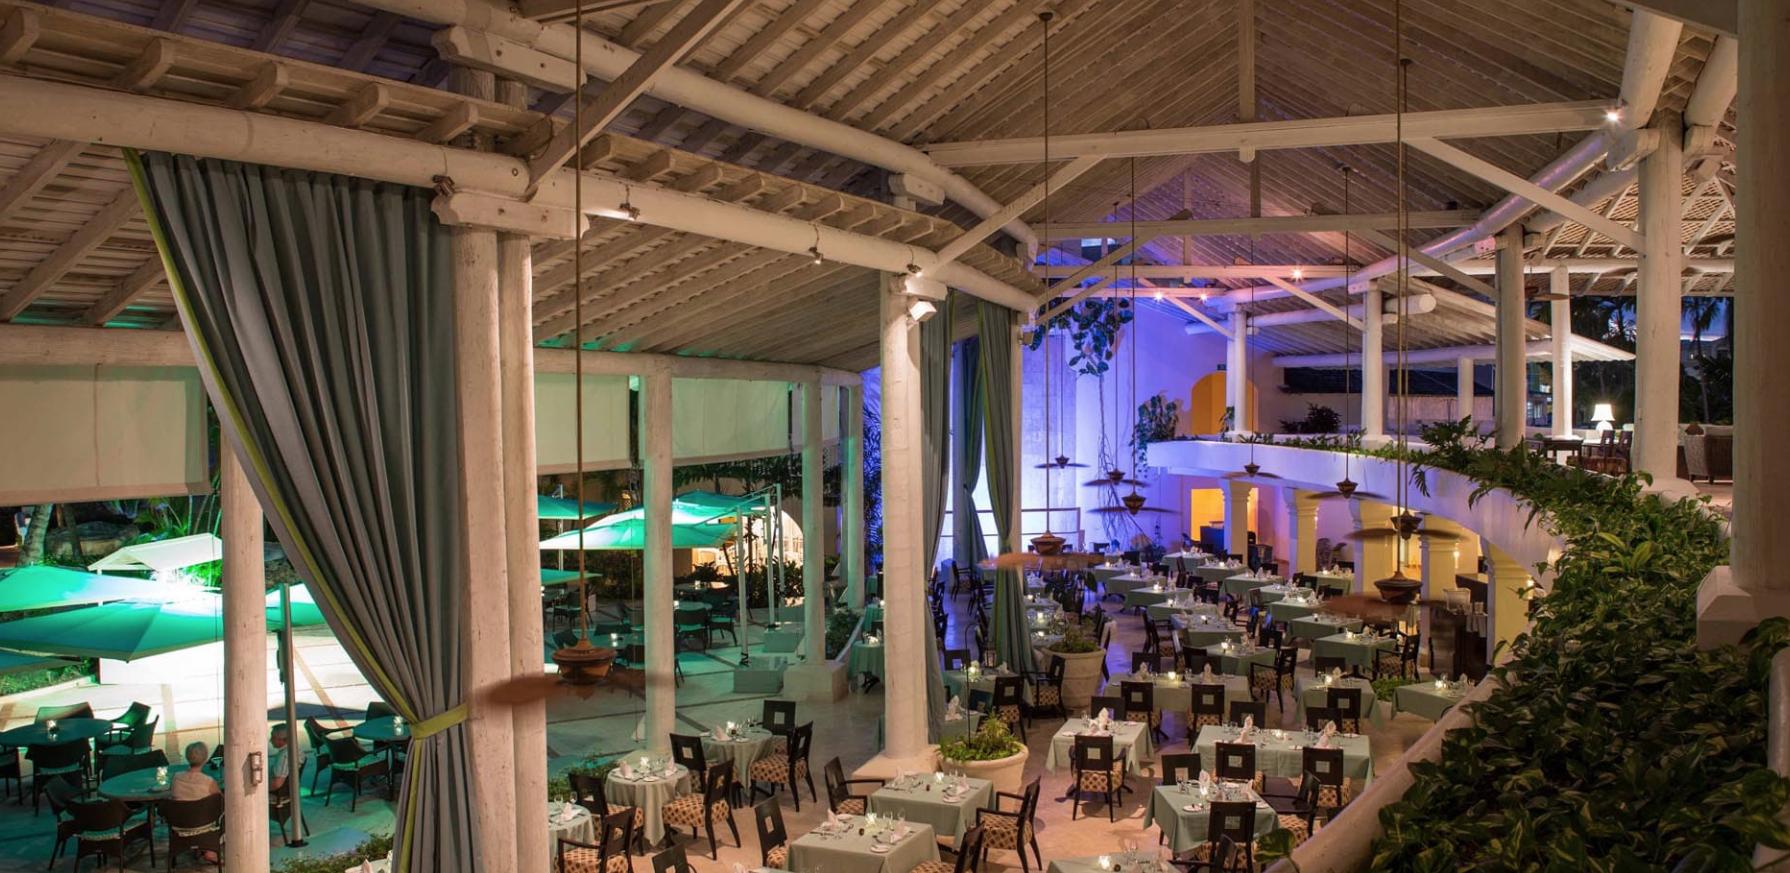 Restaurant by night